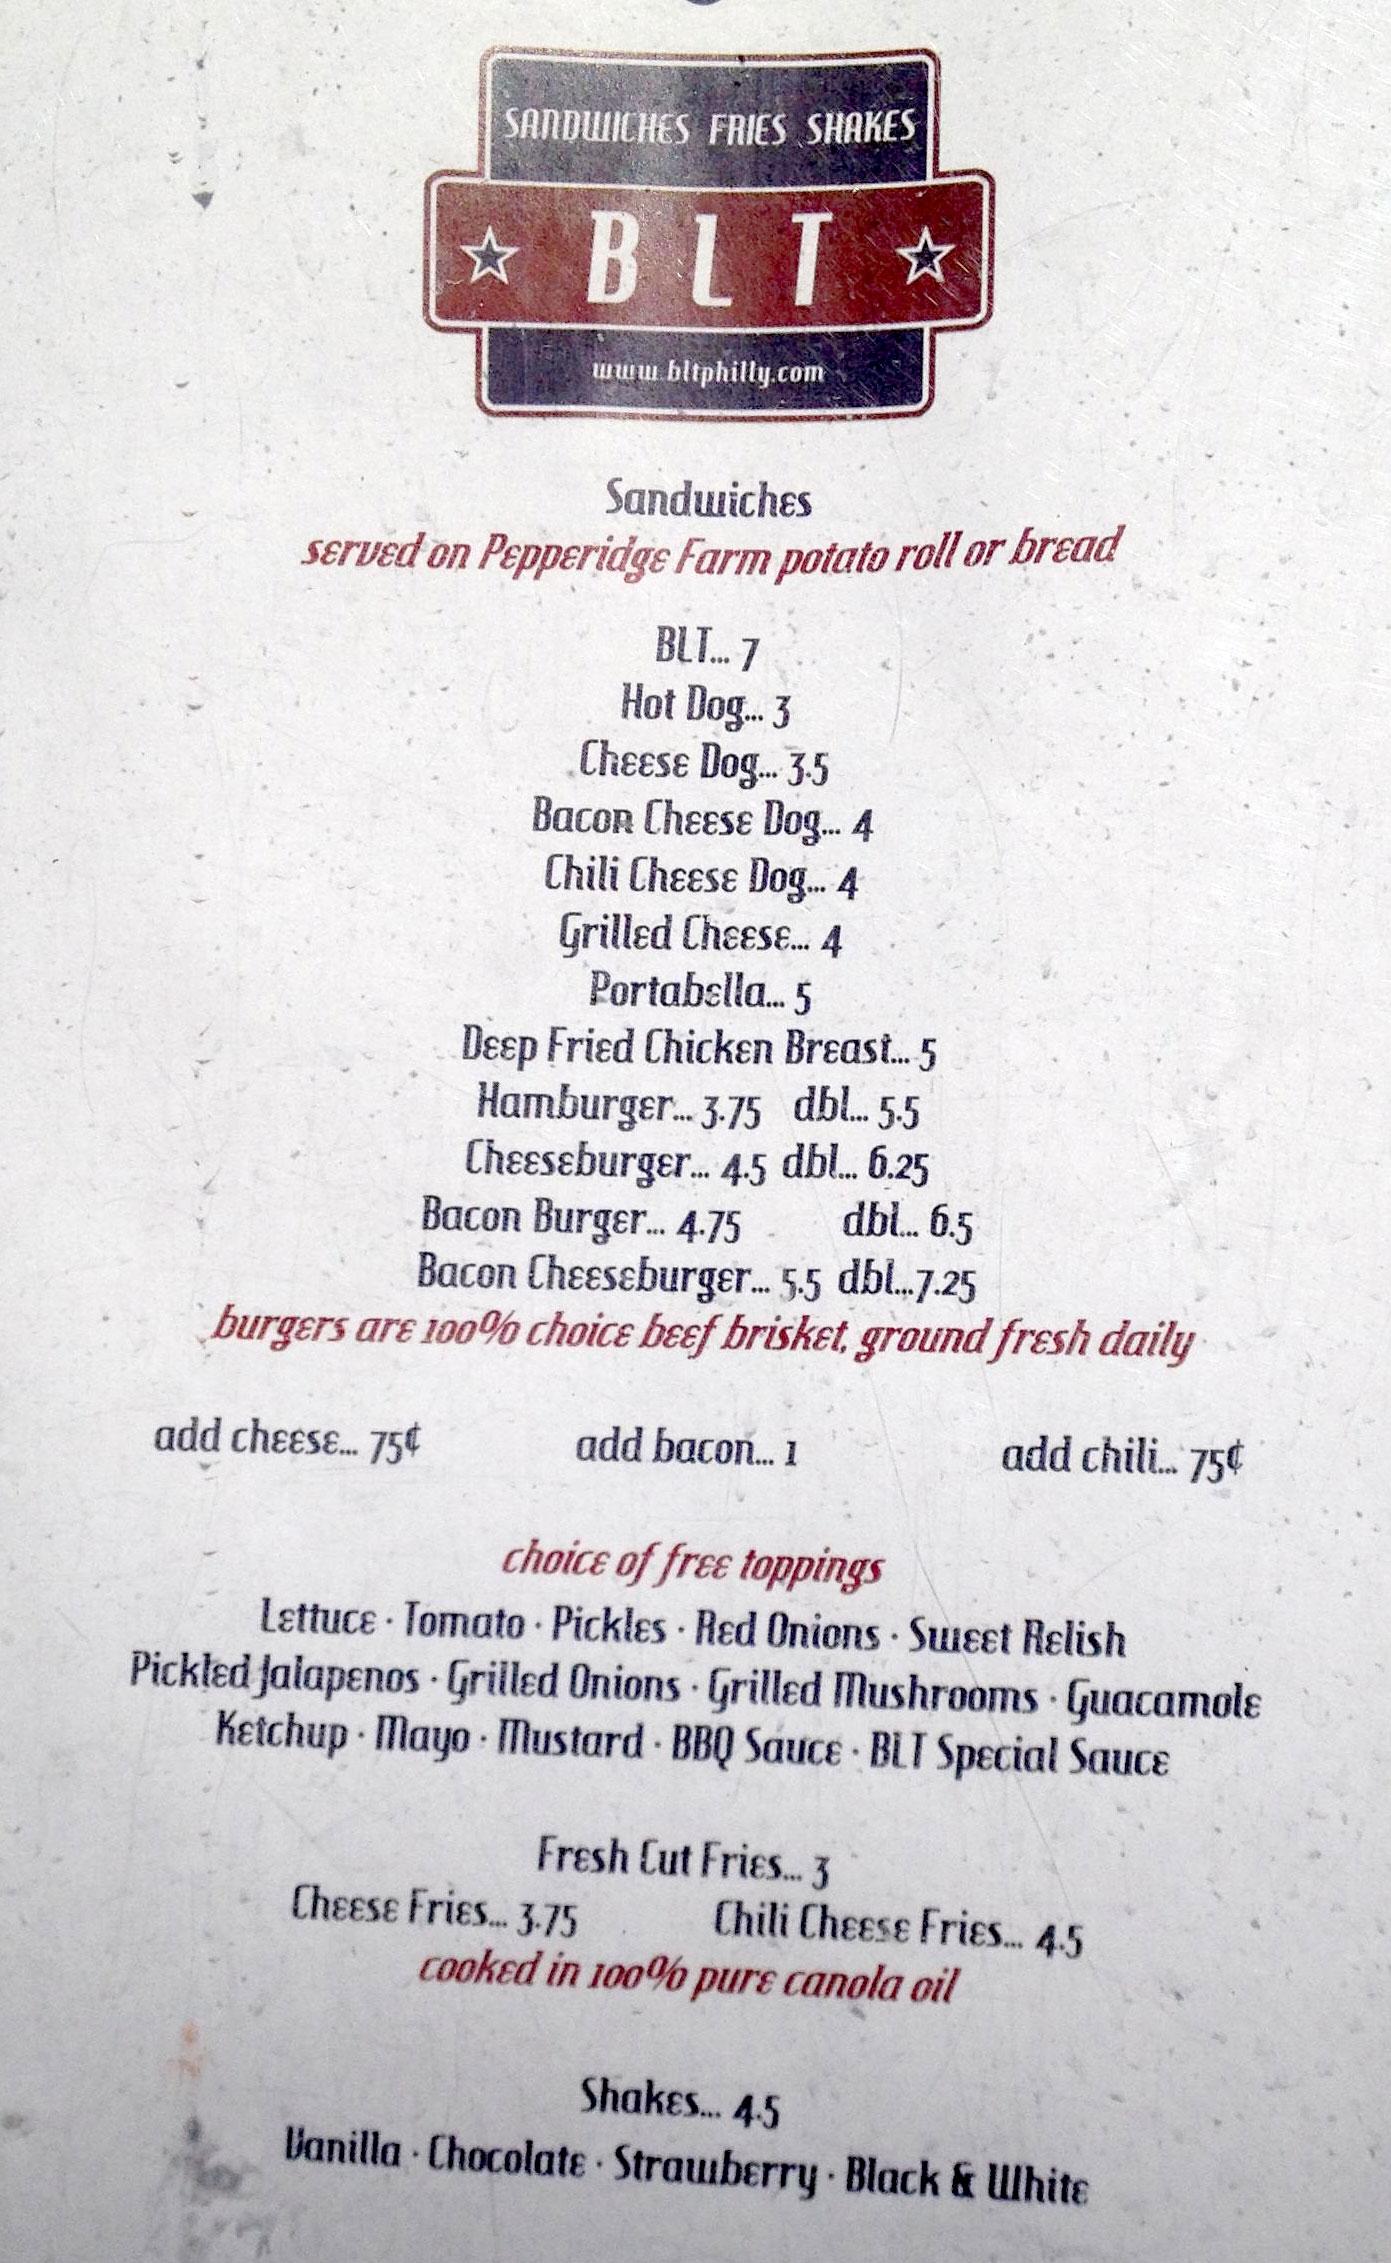 blt-menu-manayunk